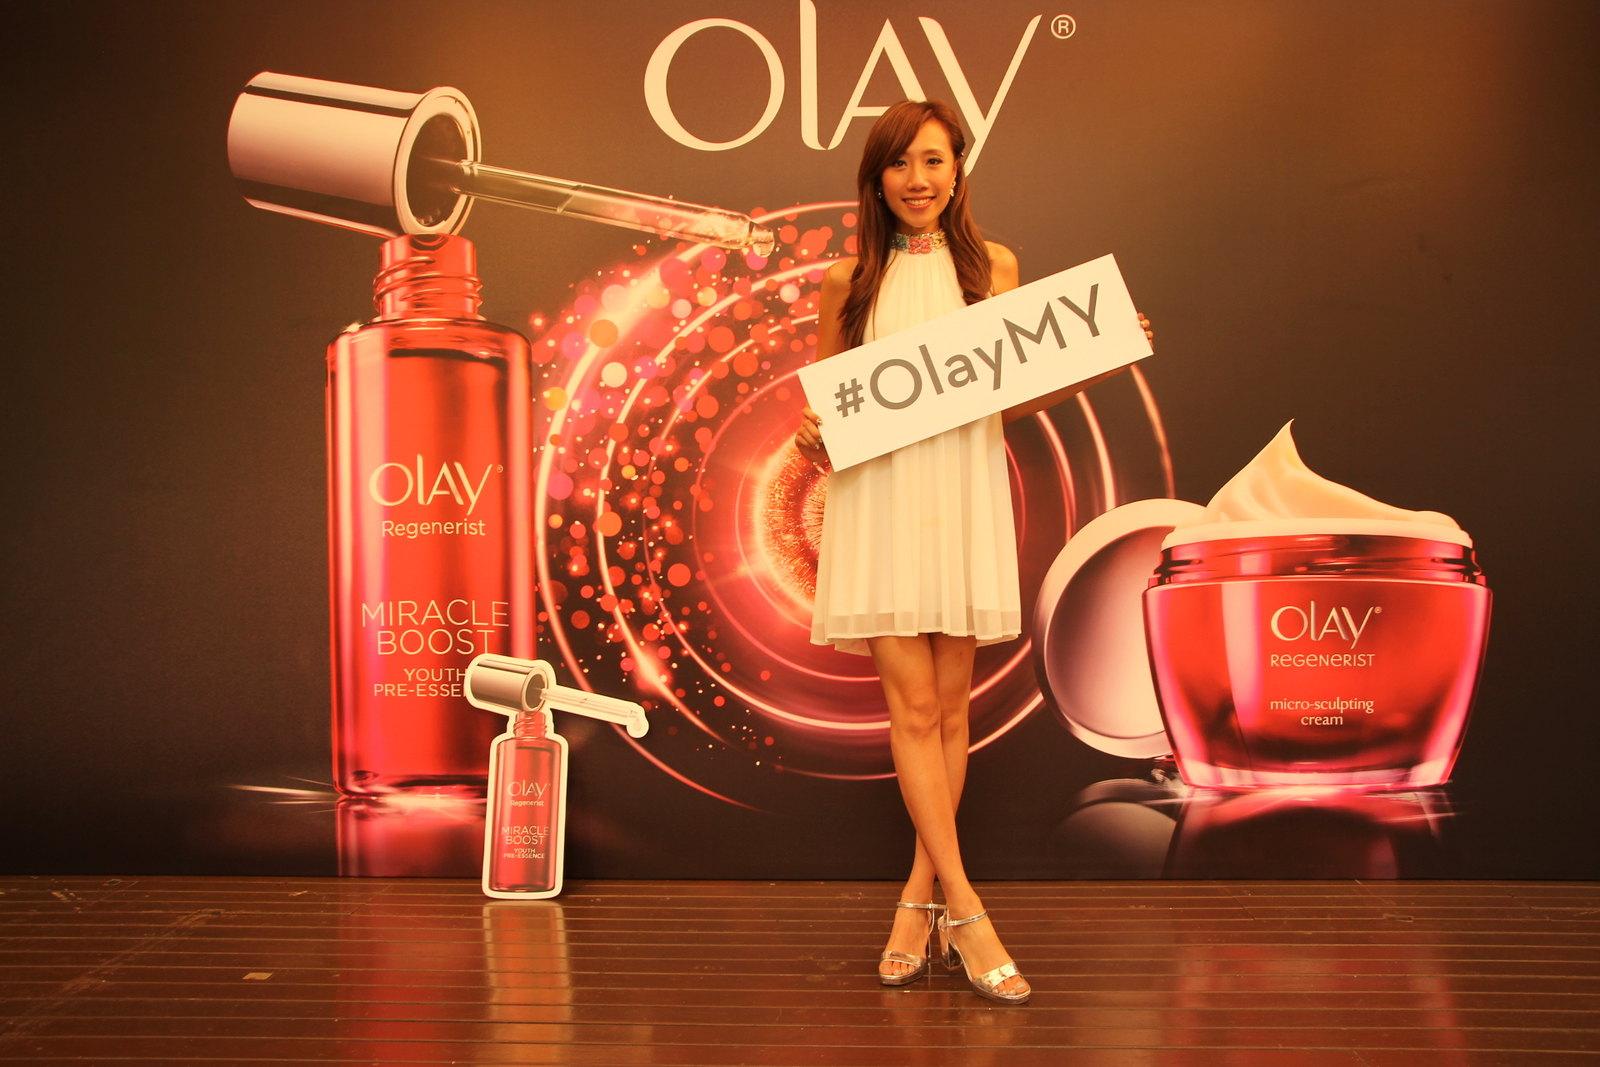 Olay Regenerist Singapore